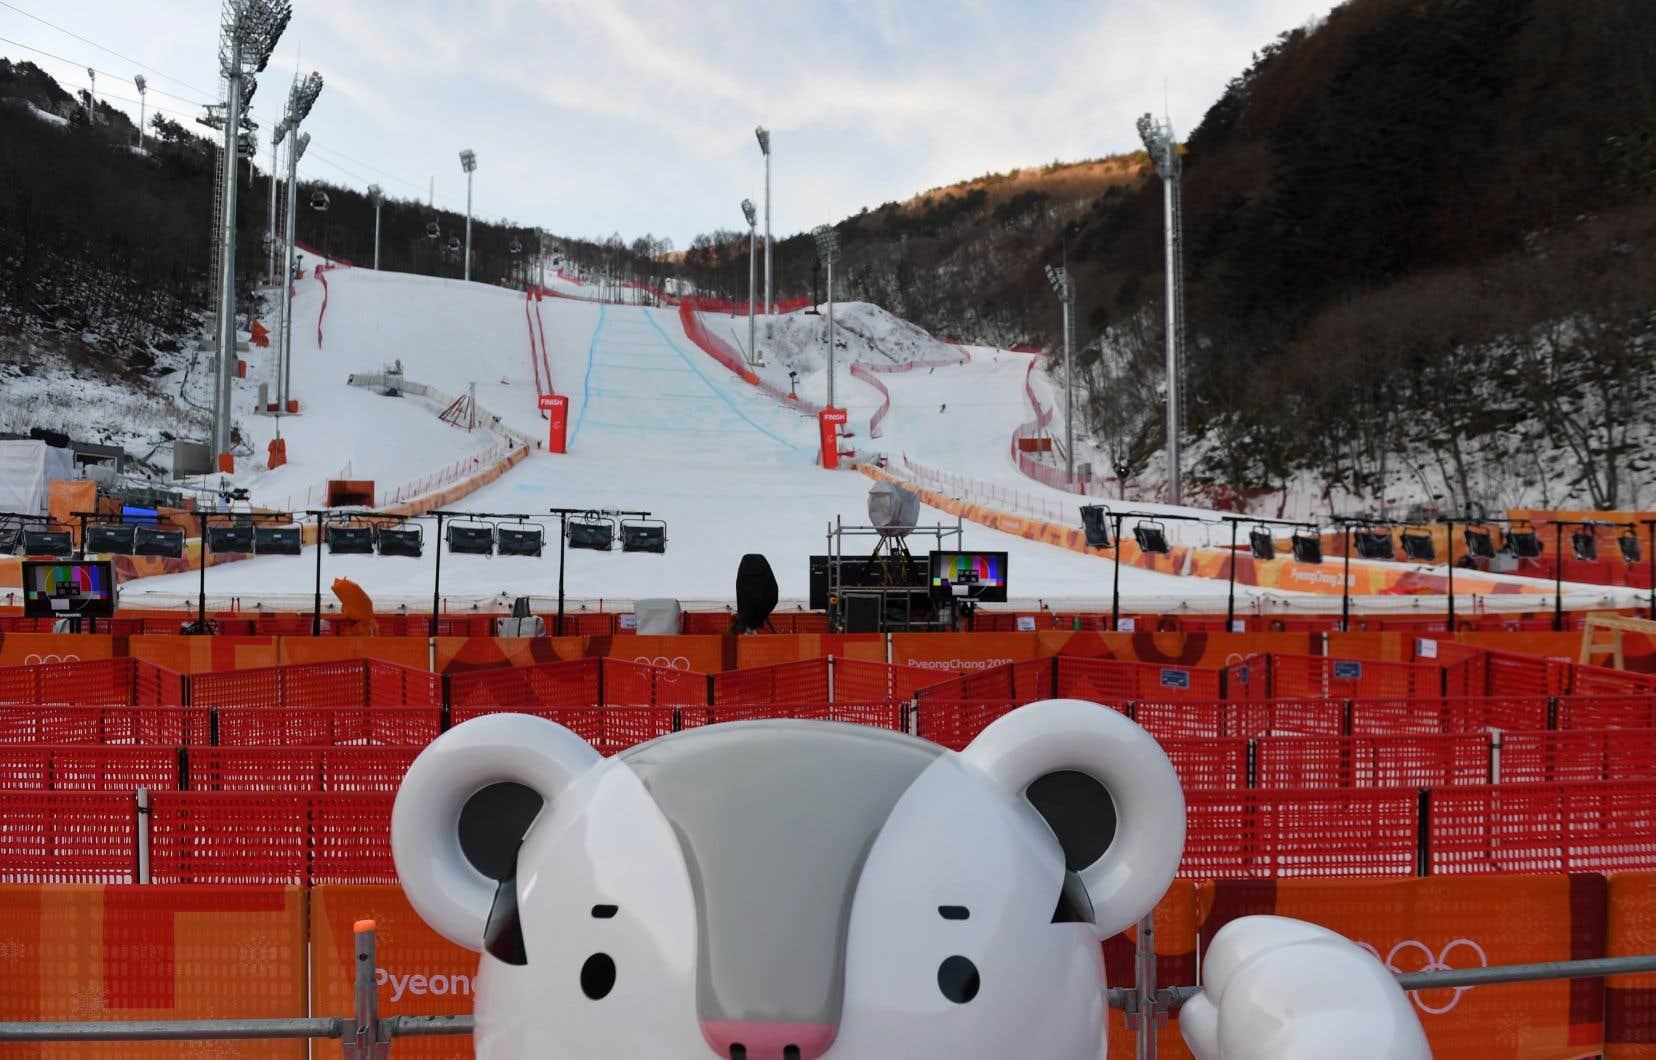 Le vent impose de reporter à jeudi la descente — Ski alpin